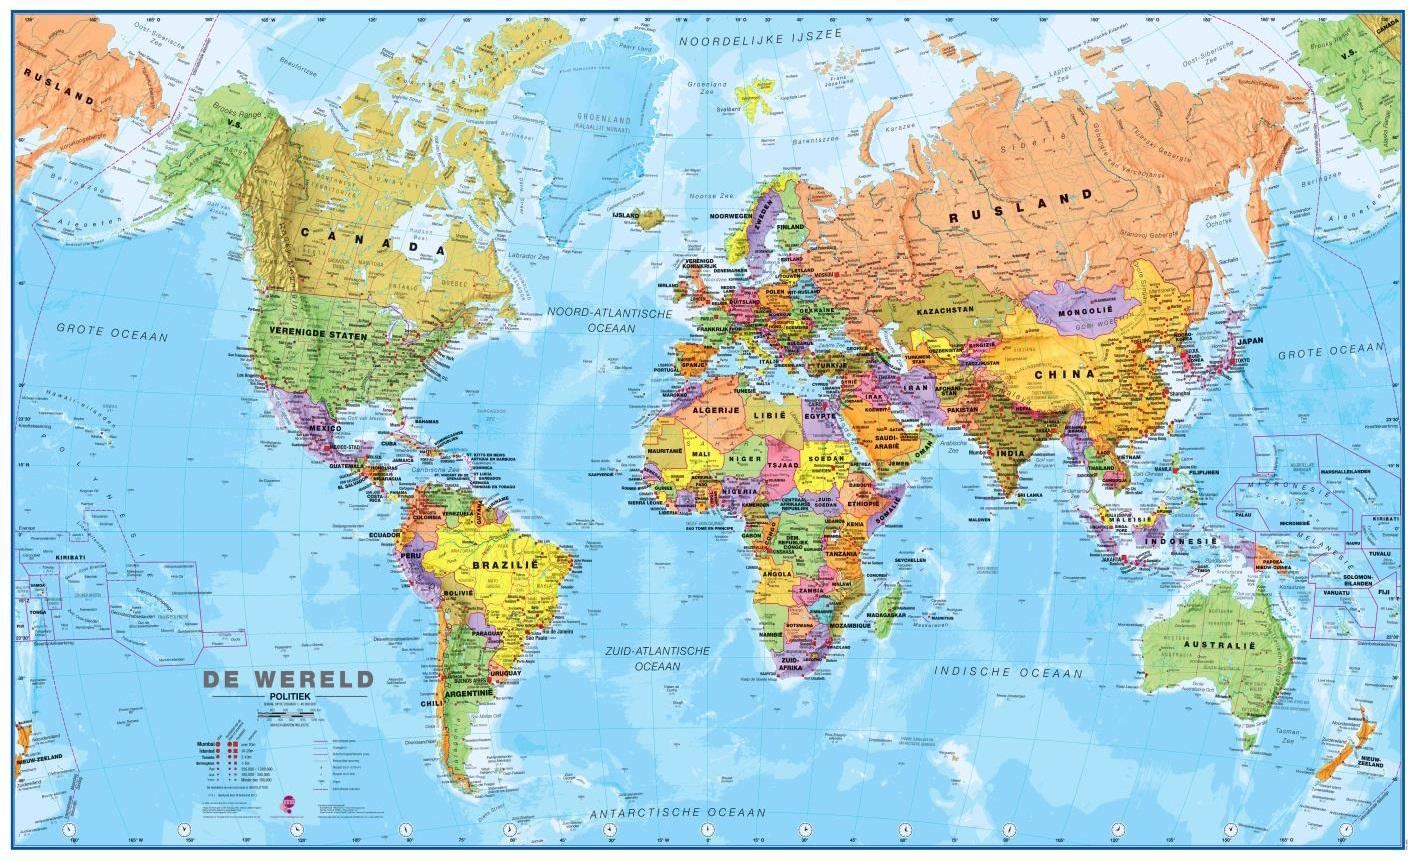 Wereldkaart - Prikbord politiek, 136 x 86 cm, | Maps International de zwerver